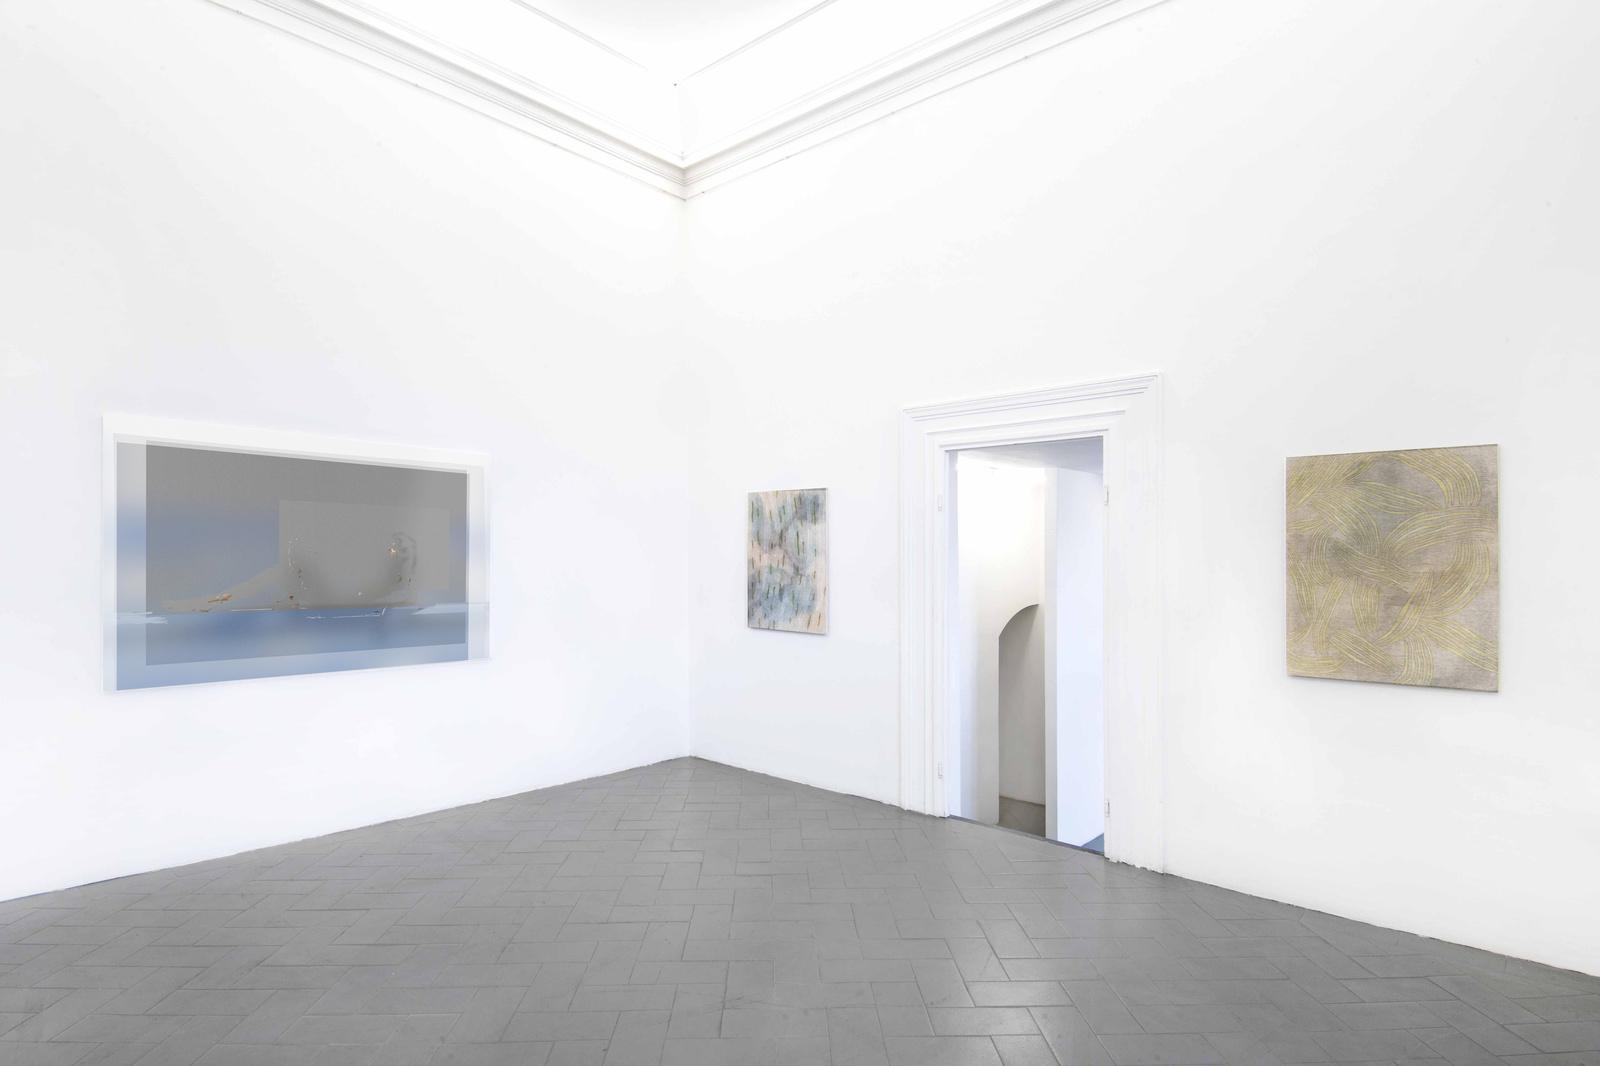 11.Installation View. Joshua Citarella, Hanna Hur. Courtesy of Eduardo secci Contemporary